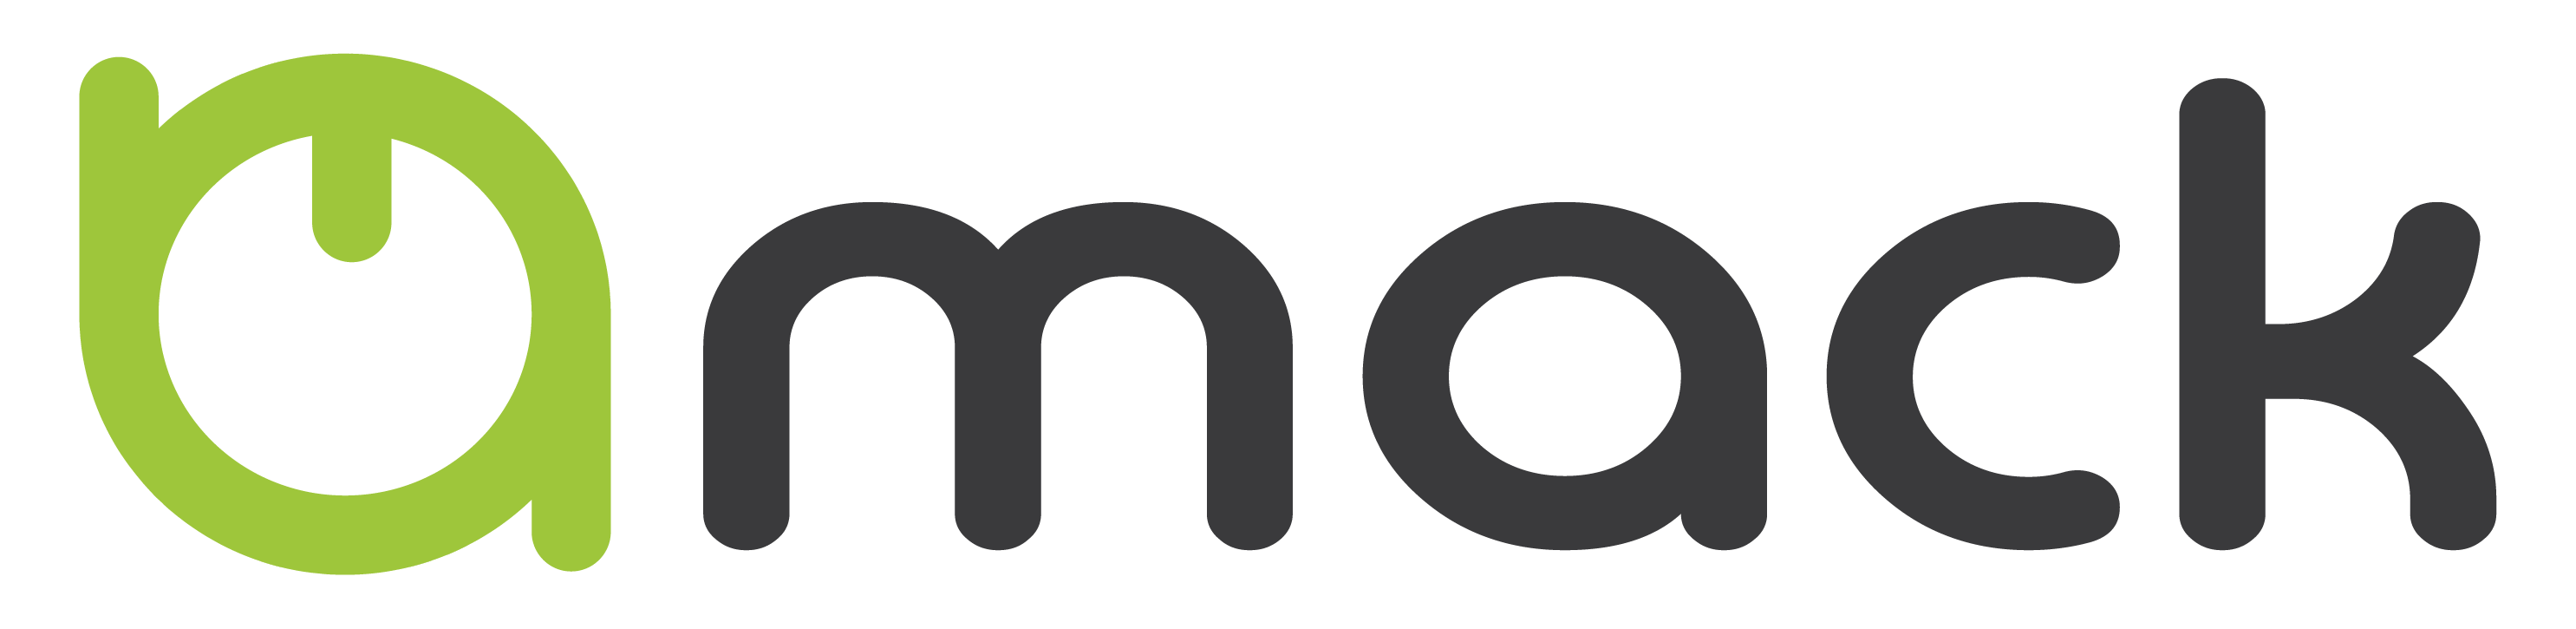 Mack Türkiye – www.mack.com.tr